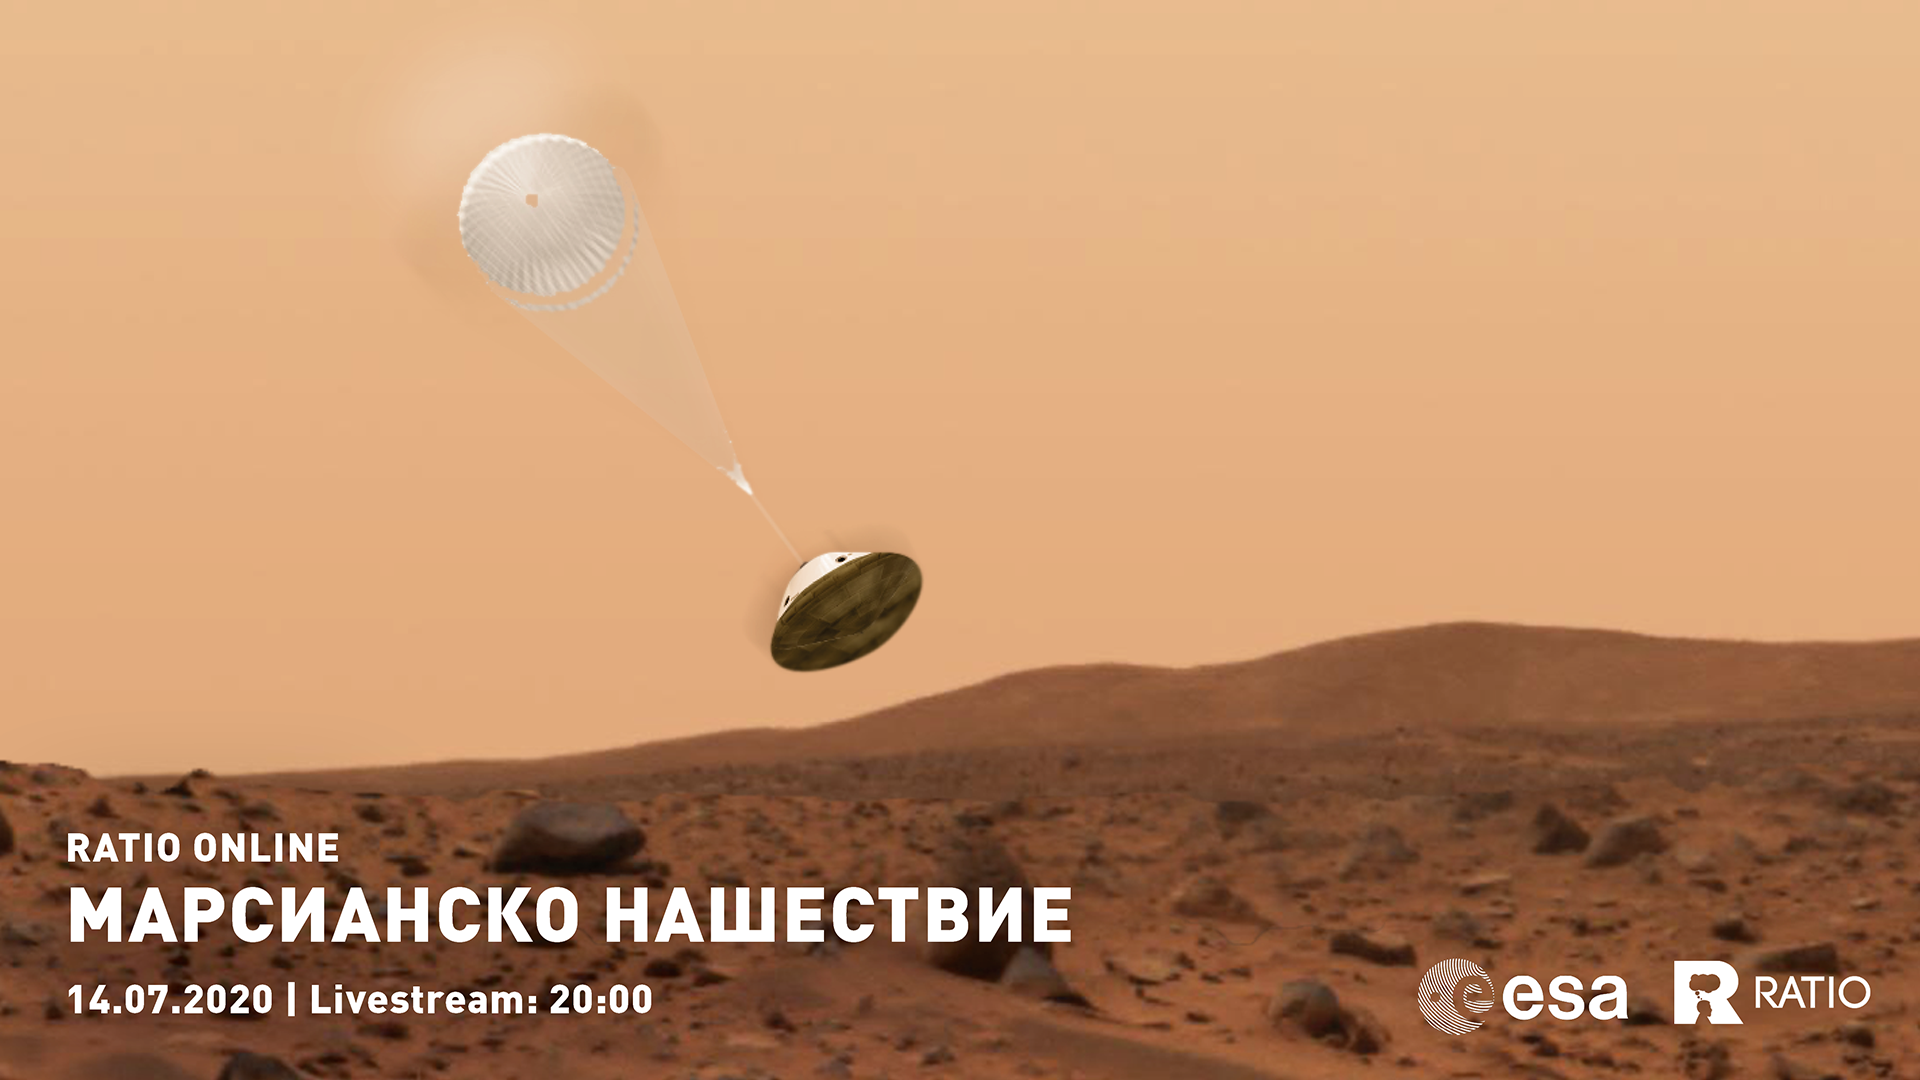 Ratio Online: Марсианско нашествие